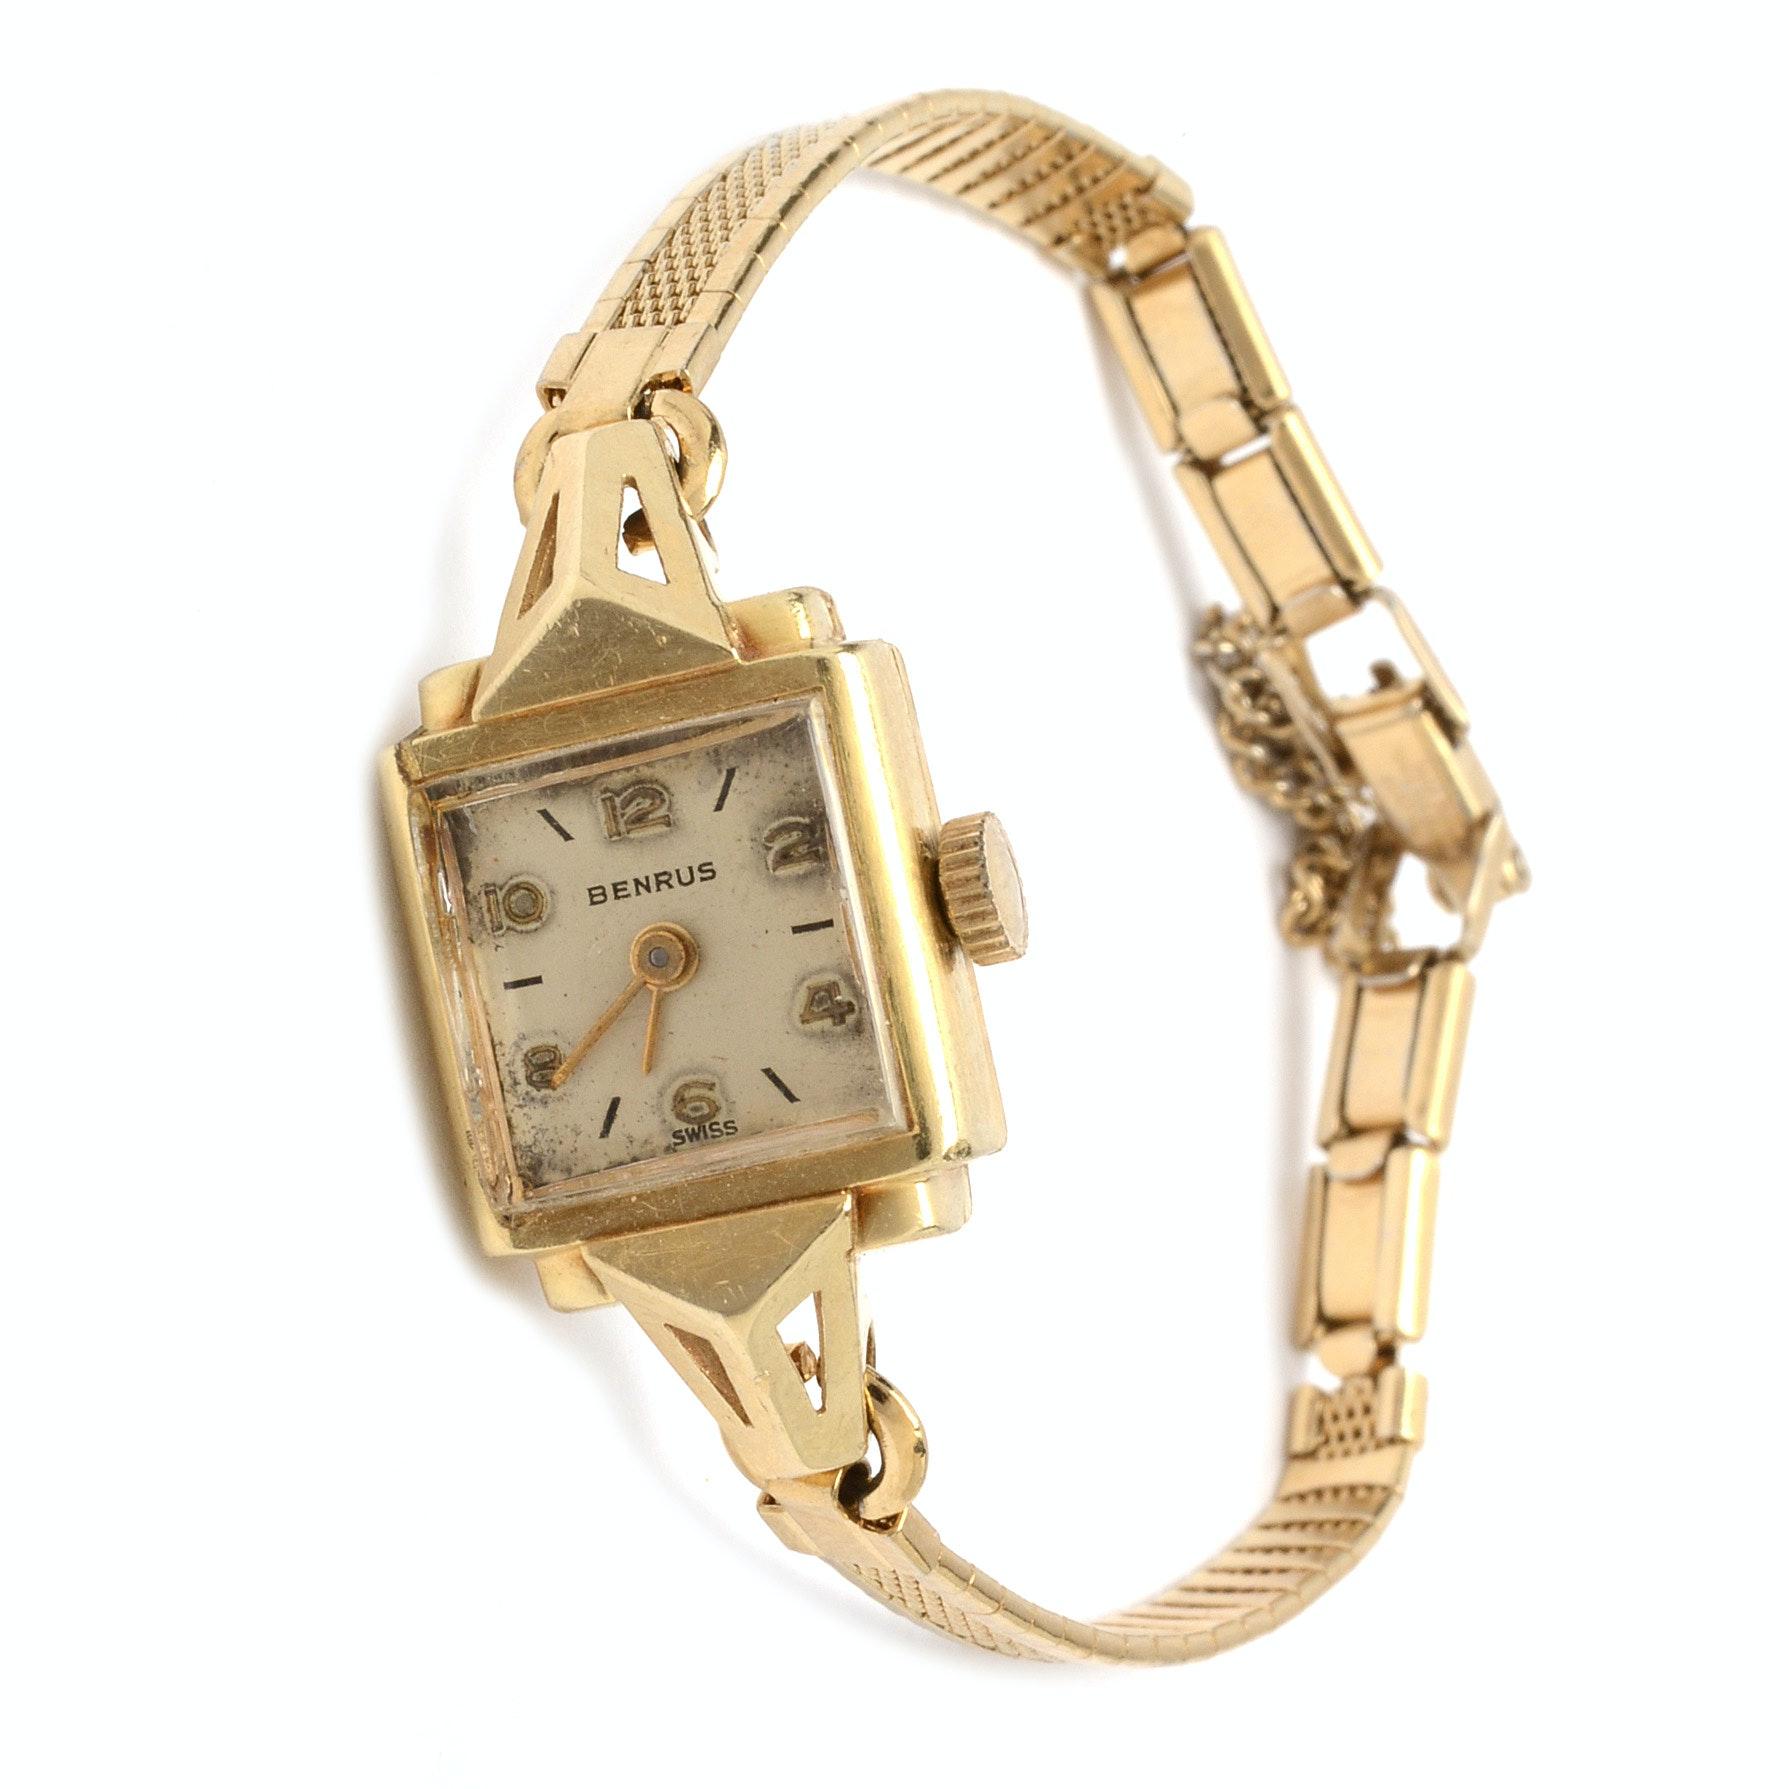 14K Yellow Gold Benrus Swiss Wristwatch